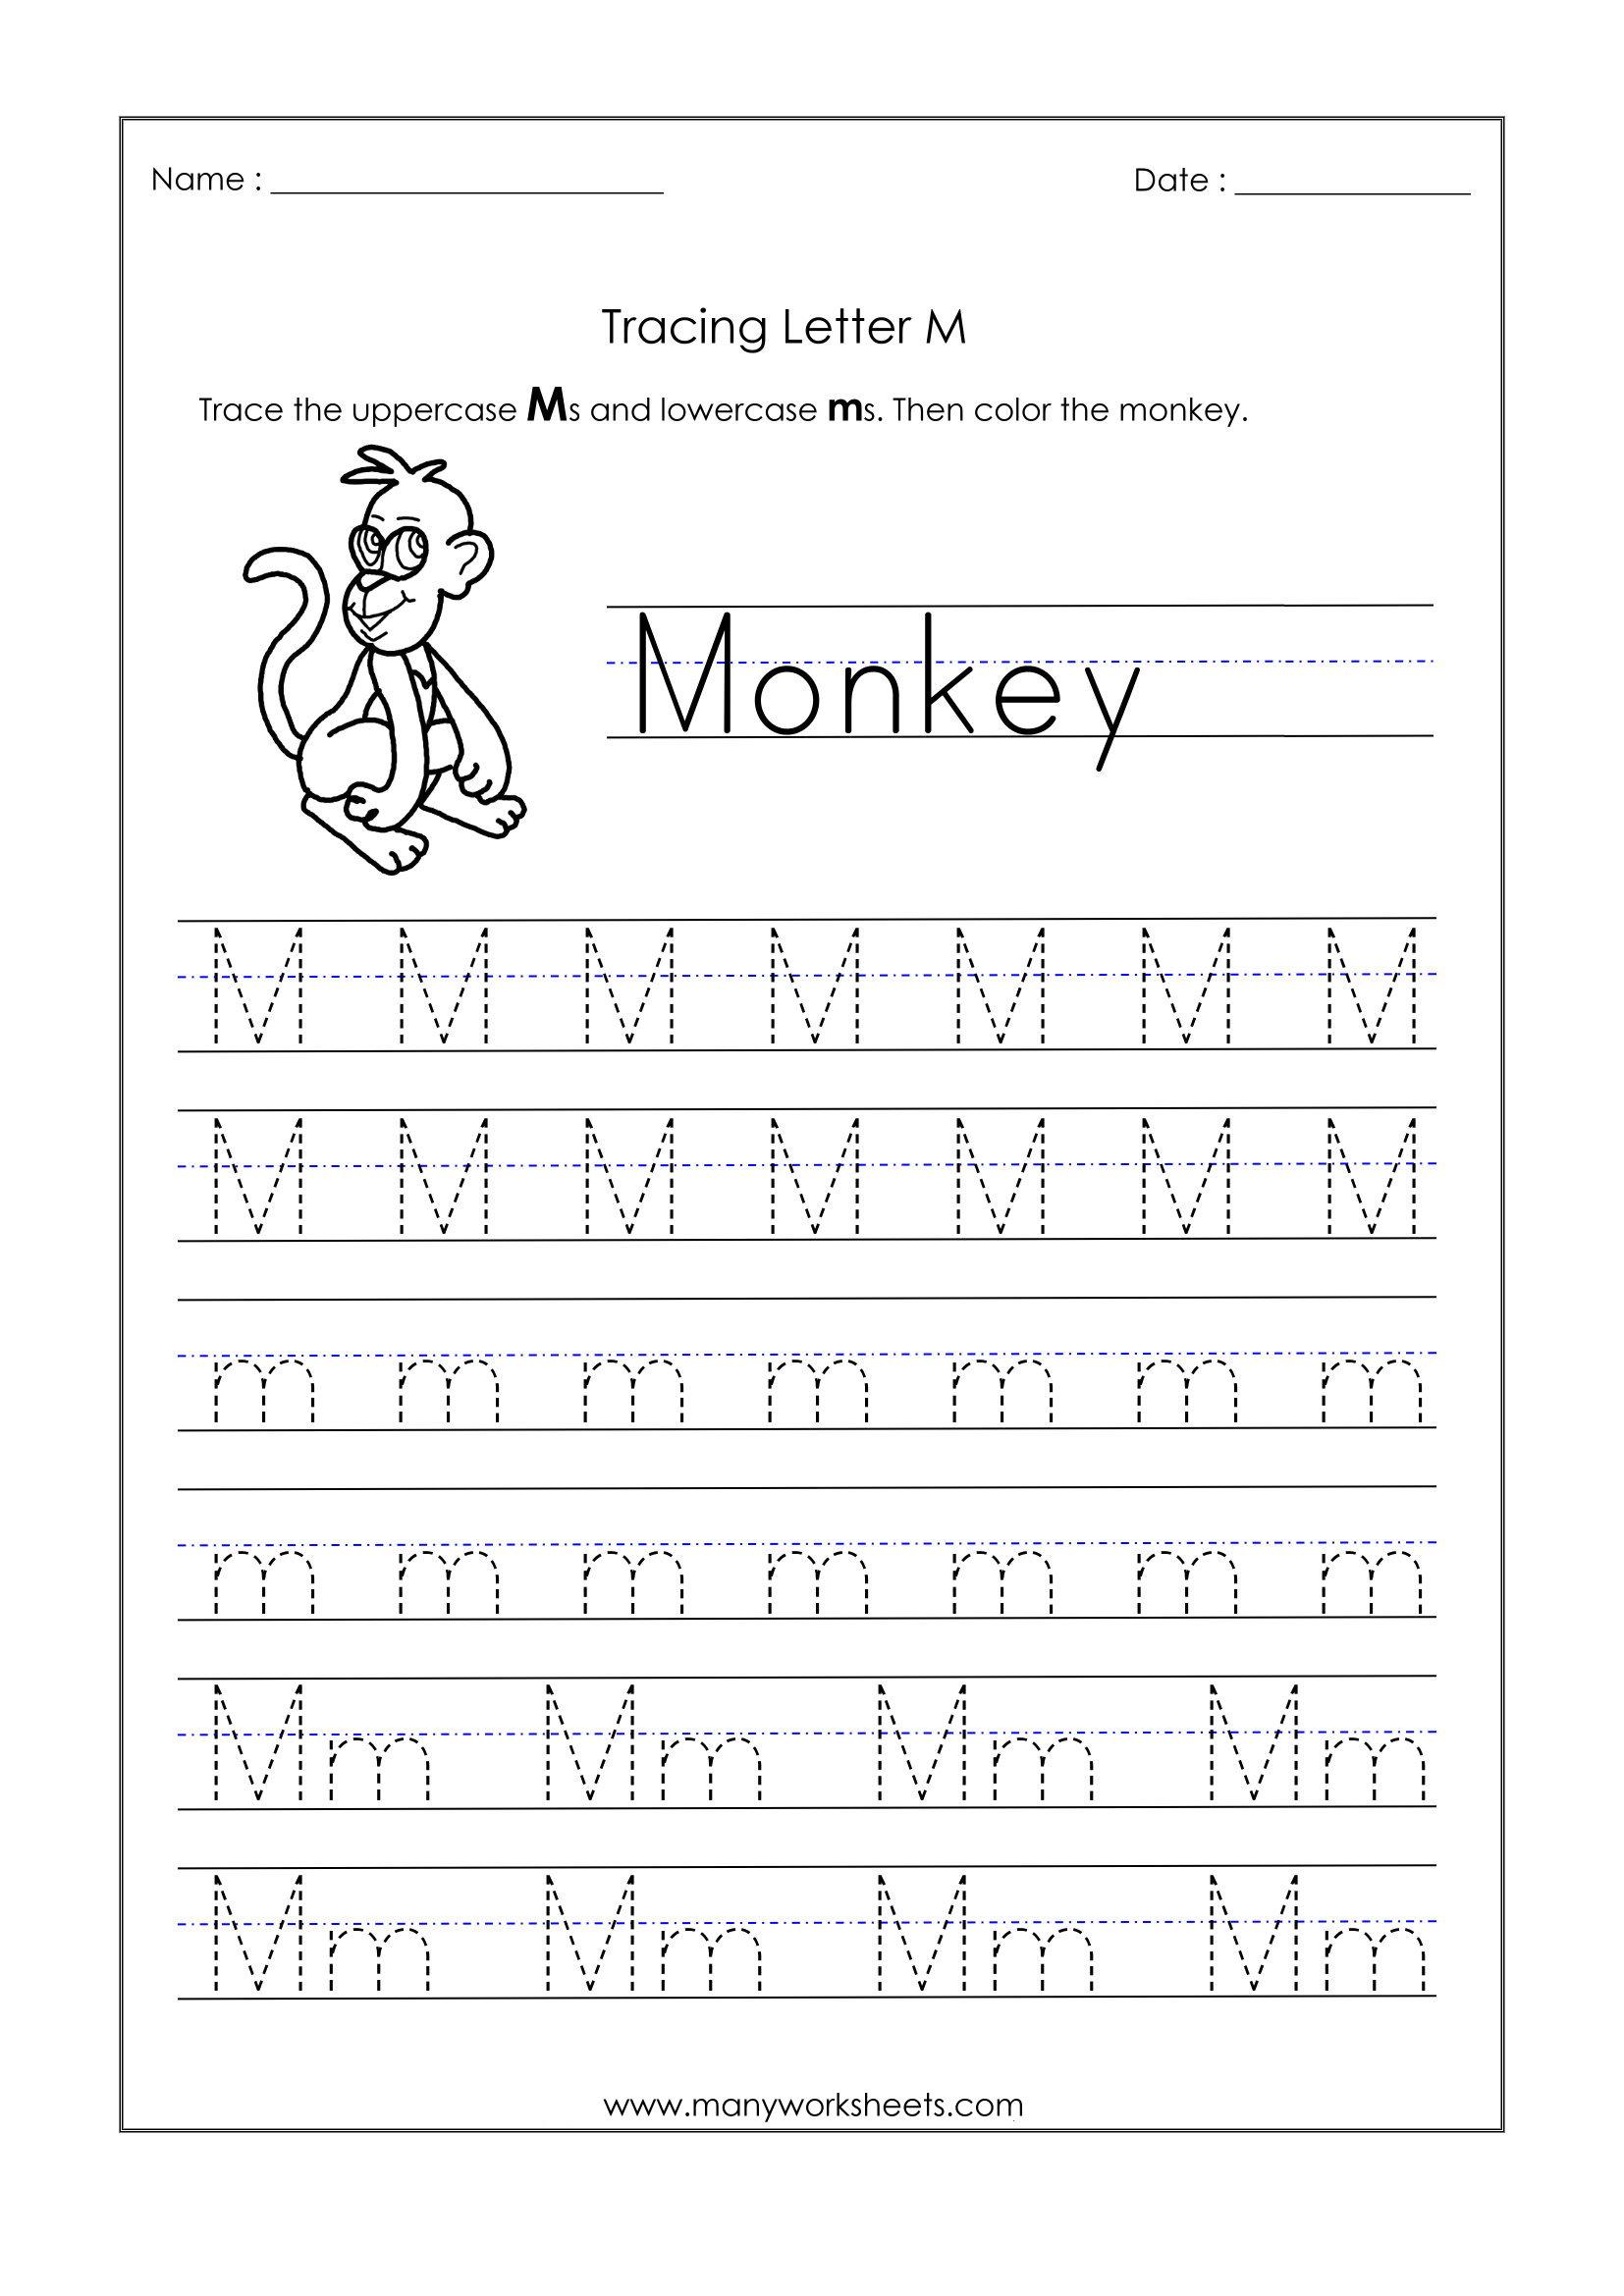 Math Worksheet : 42 Kindergarten Tracing Worksheets Picture with Letter M Tracing Worksheet